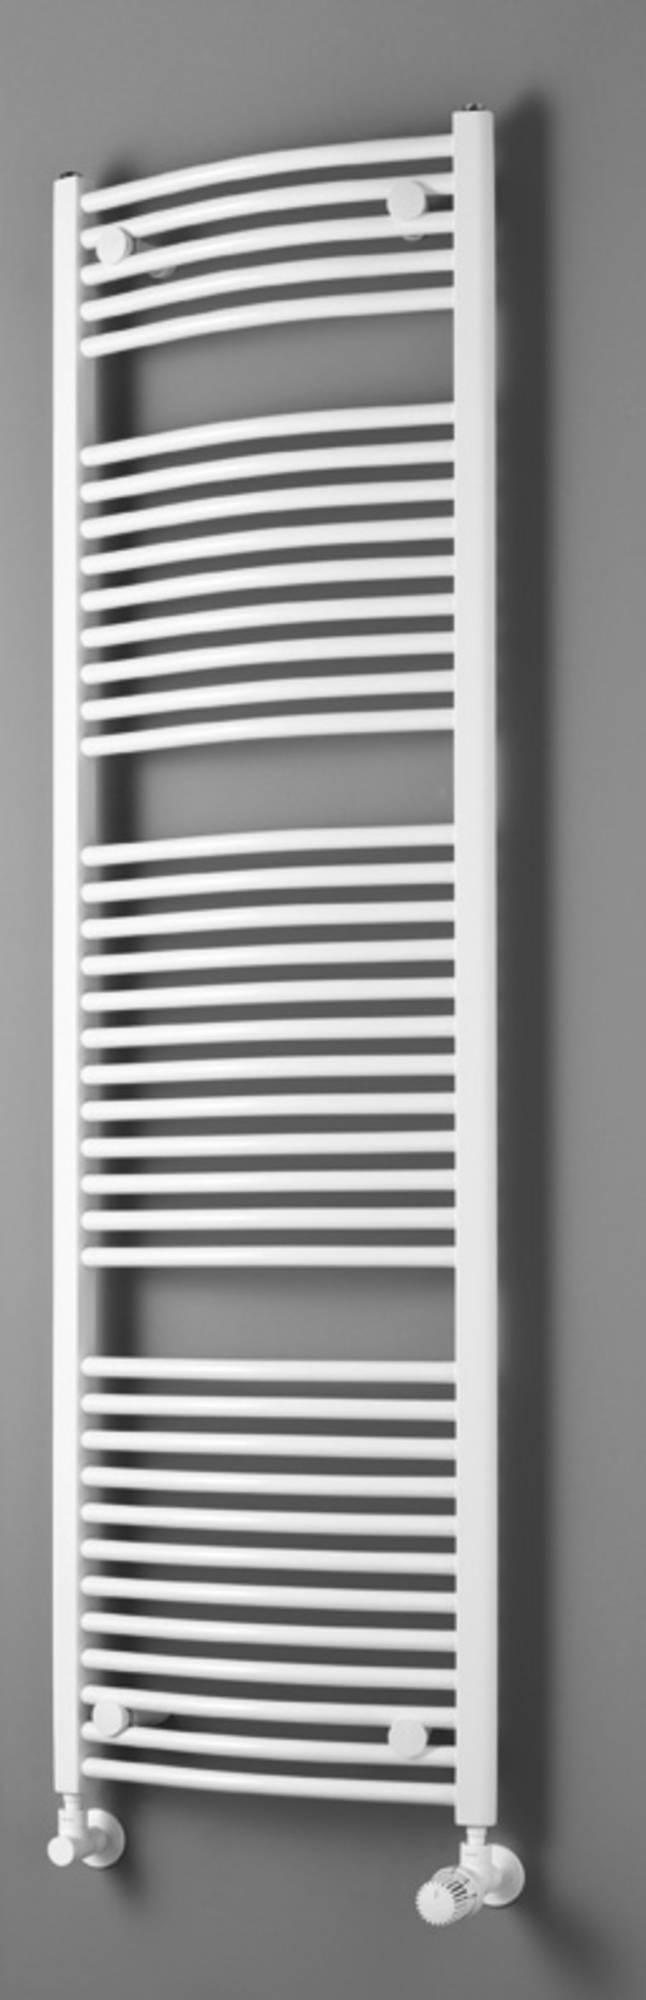 Ben Samos Designradiator 60x77,5cm 457watt Wit